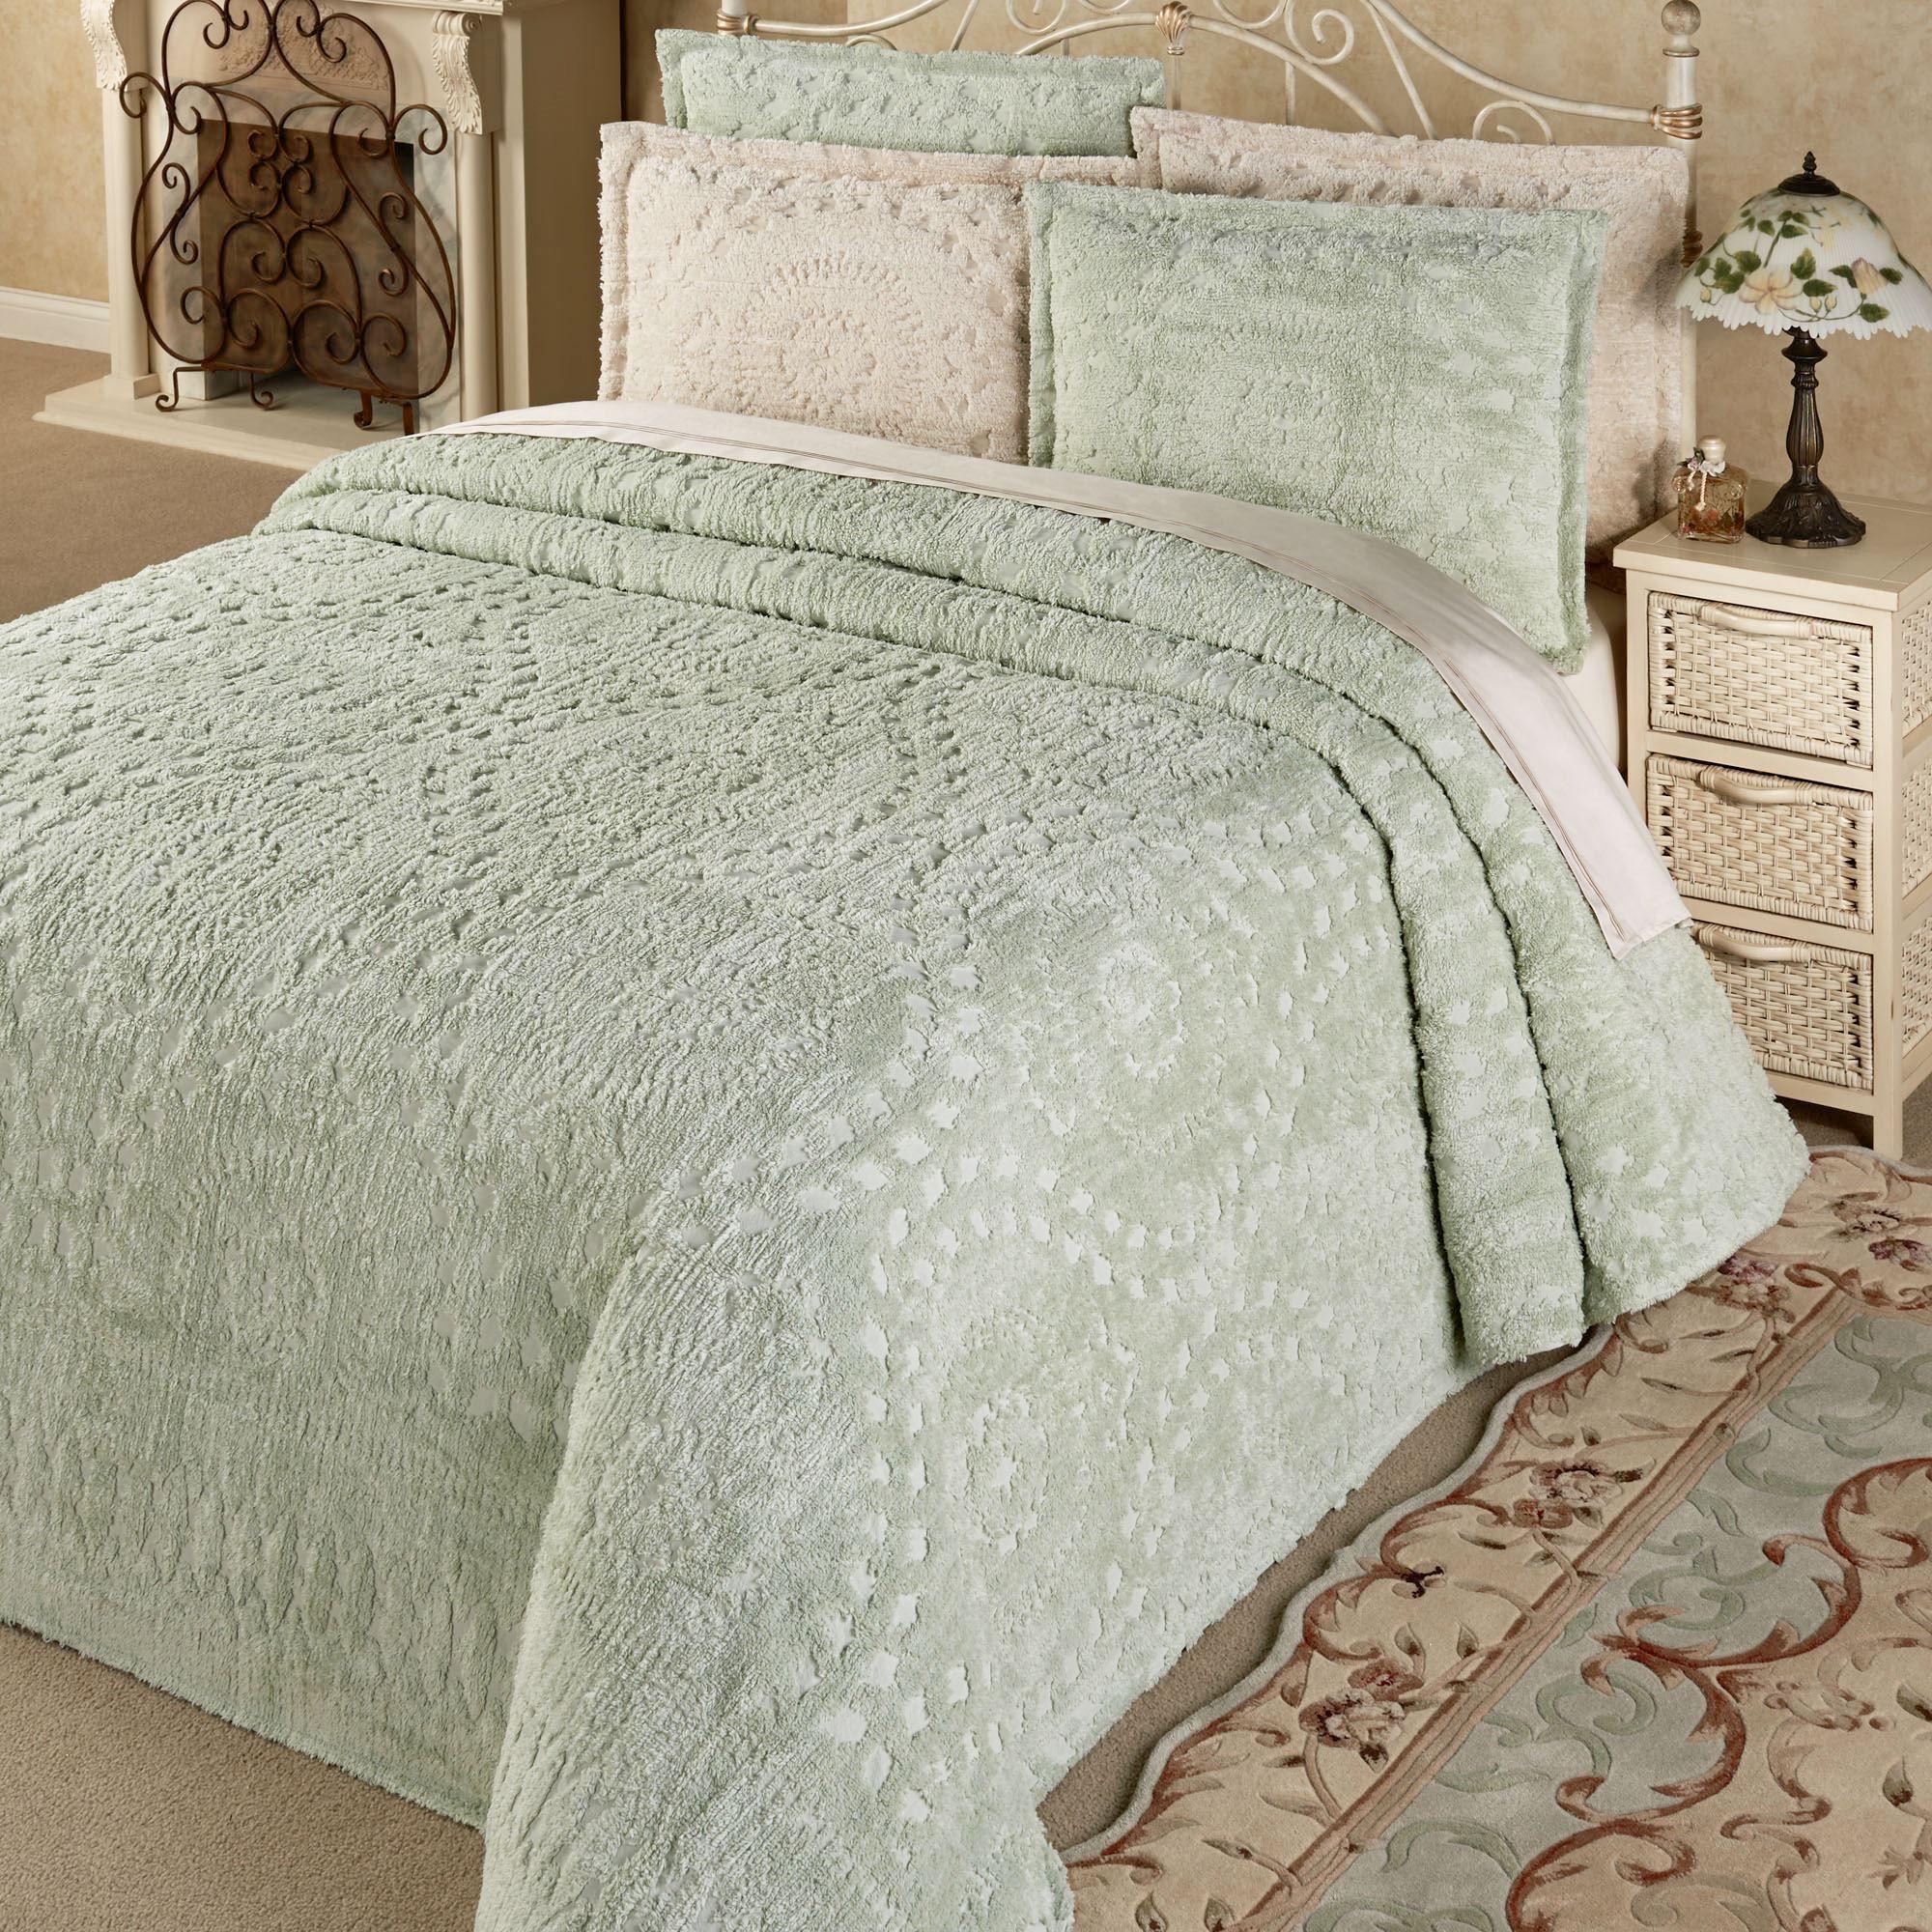 Chenille Bedspreads.Rio Lightweight Cotton Chenille Bedspread Bedding